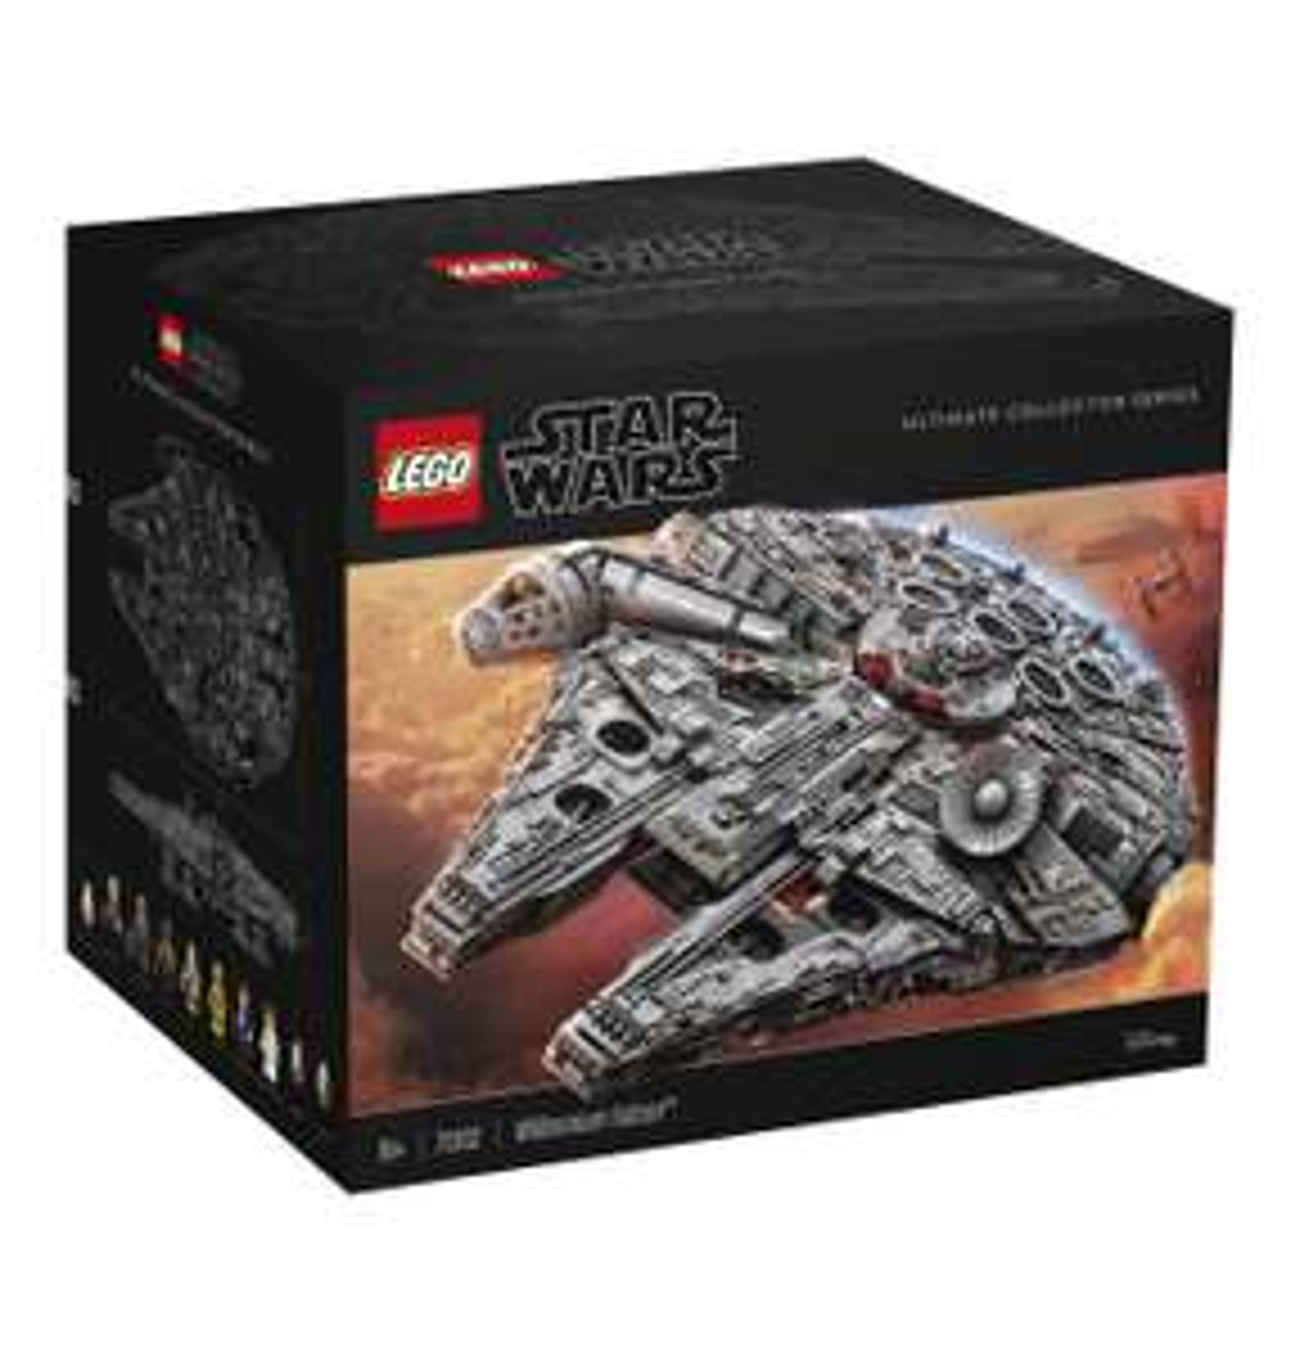 Lego Star Wars Millennium Falcon UCS (75192) für 605,15 Euro (El Corte Inglés)